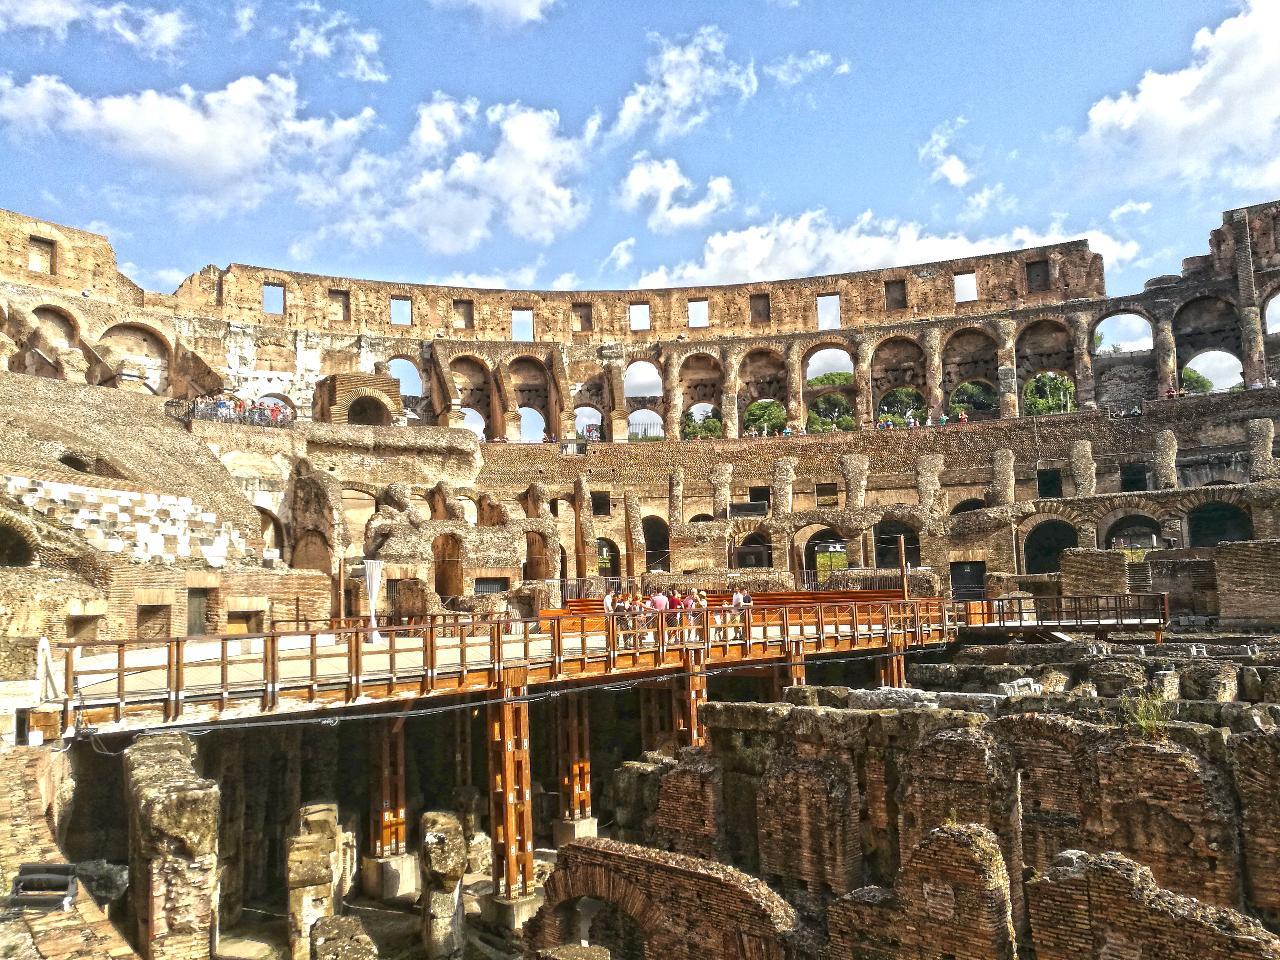 Colosseum Underground Tour — Max 12 People